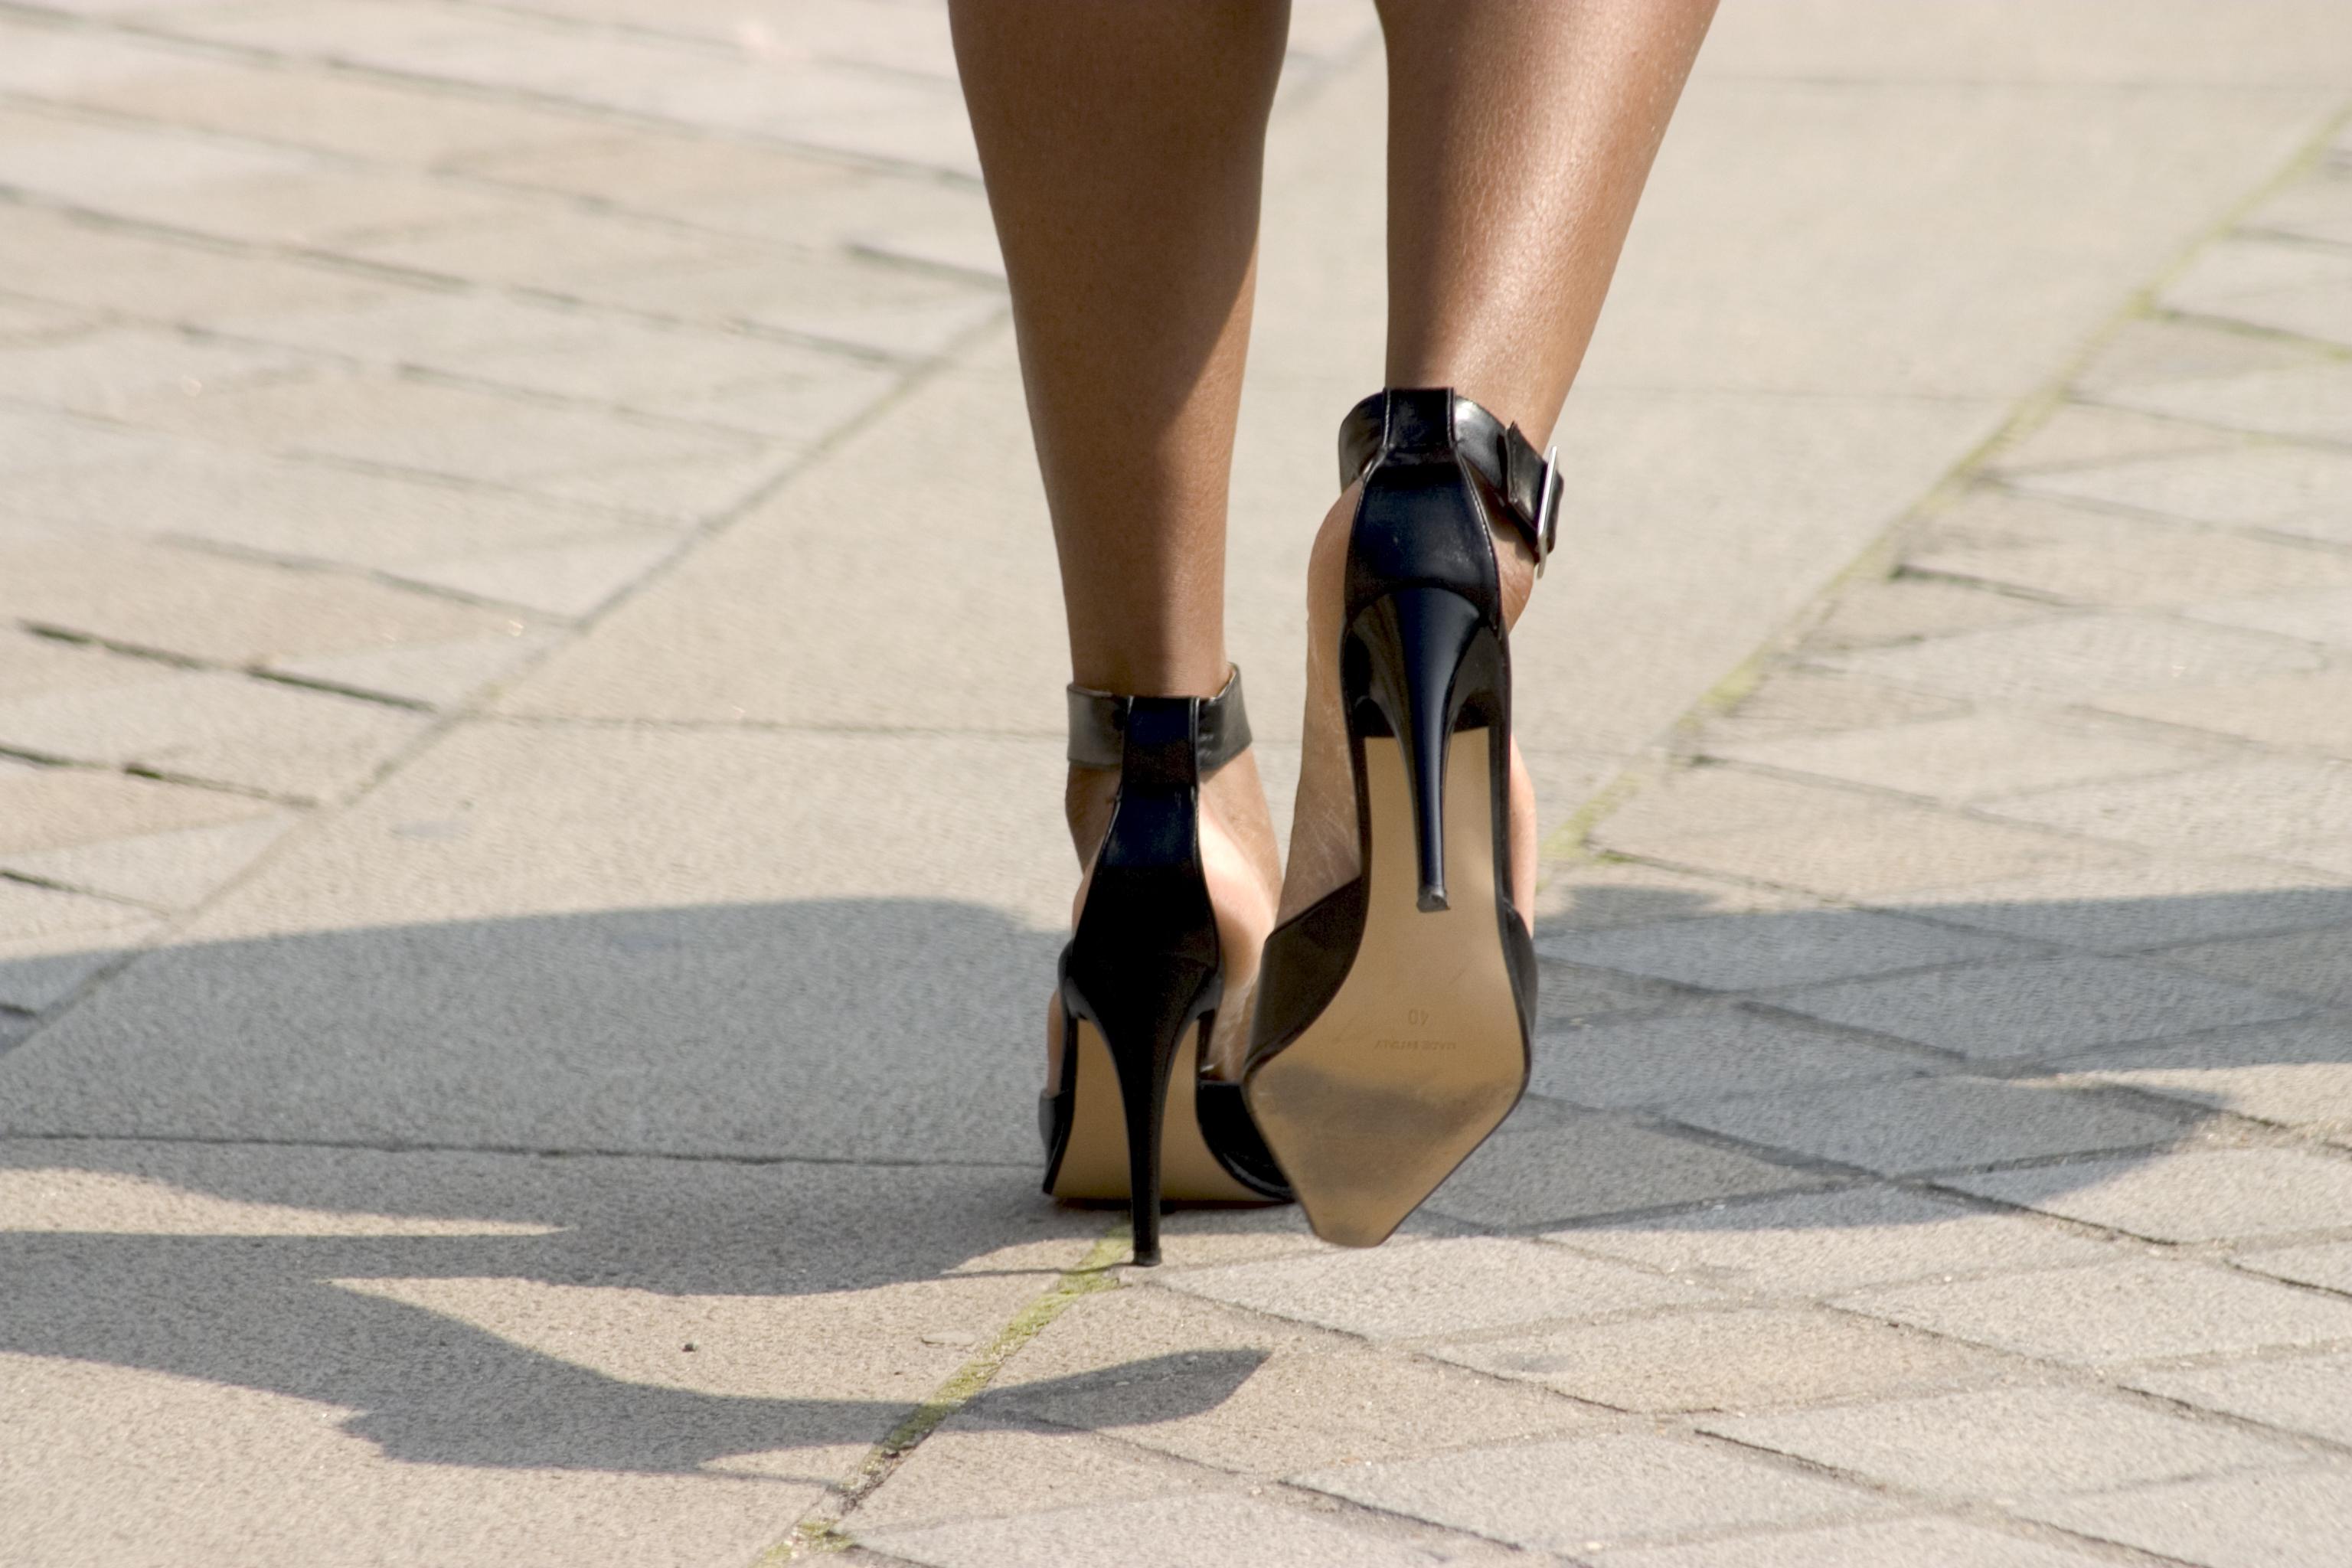 кедр картинки с ногами на каблуках кадре крайне важная